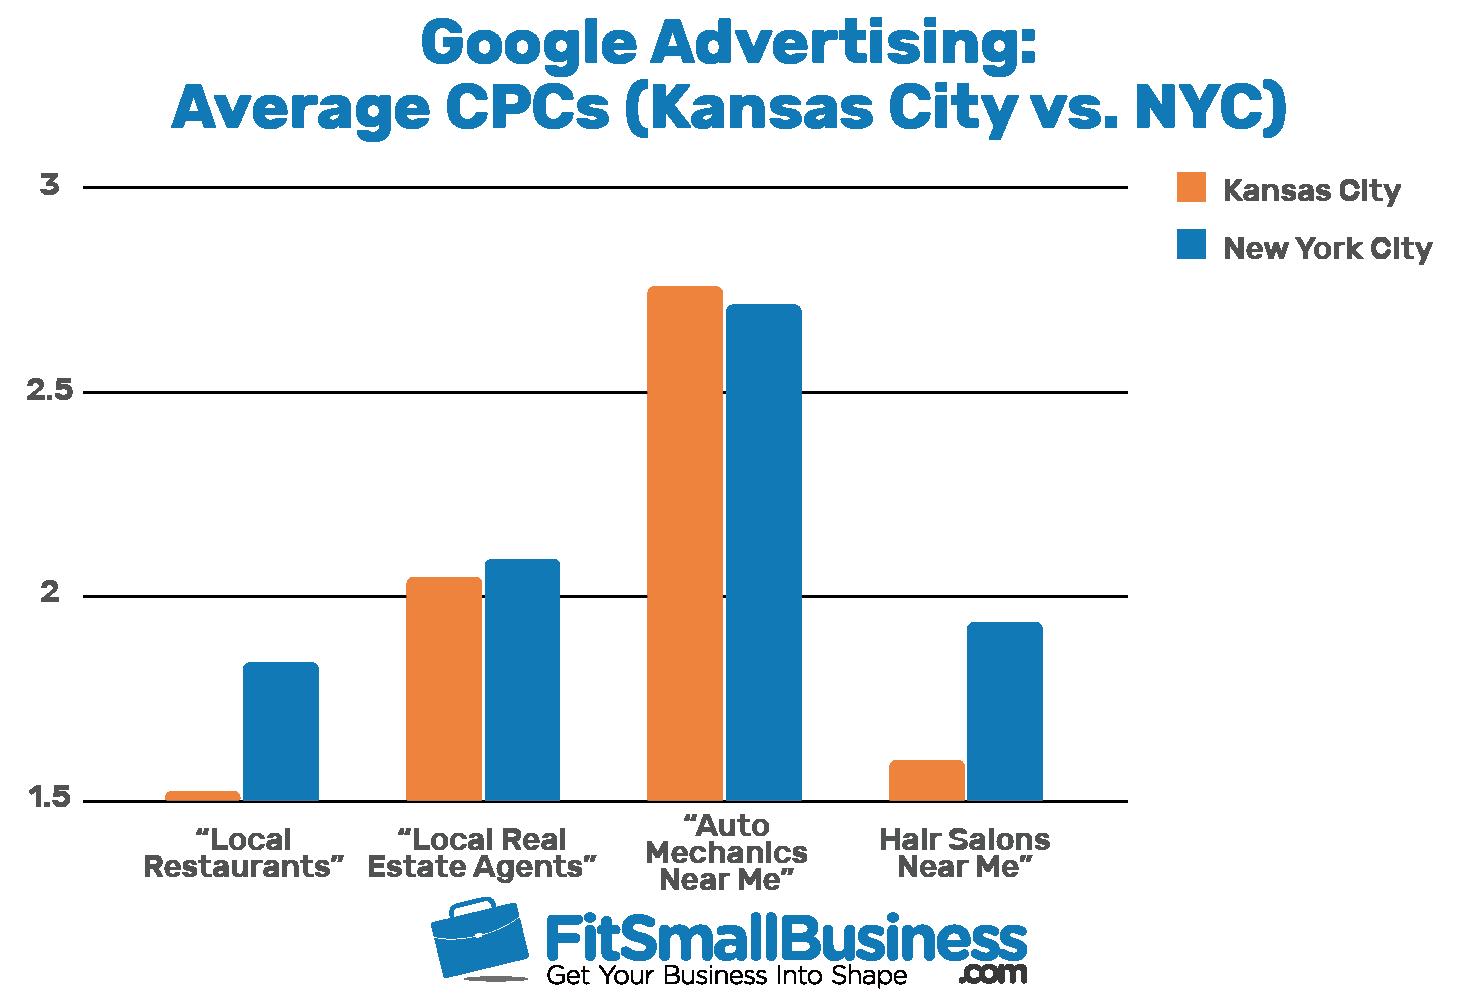 Google Advertising Average CPCs Bar Graph